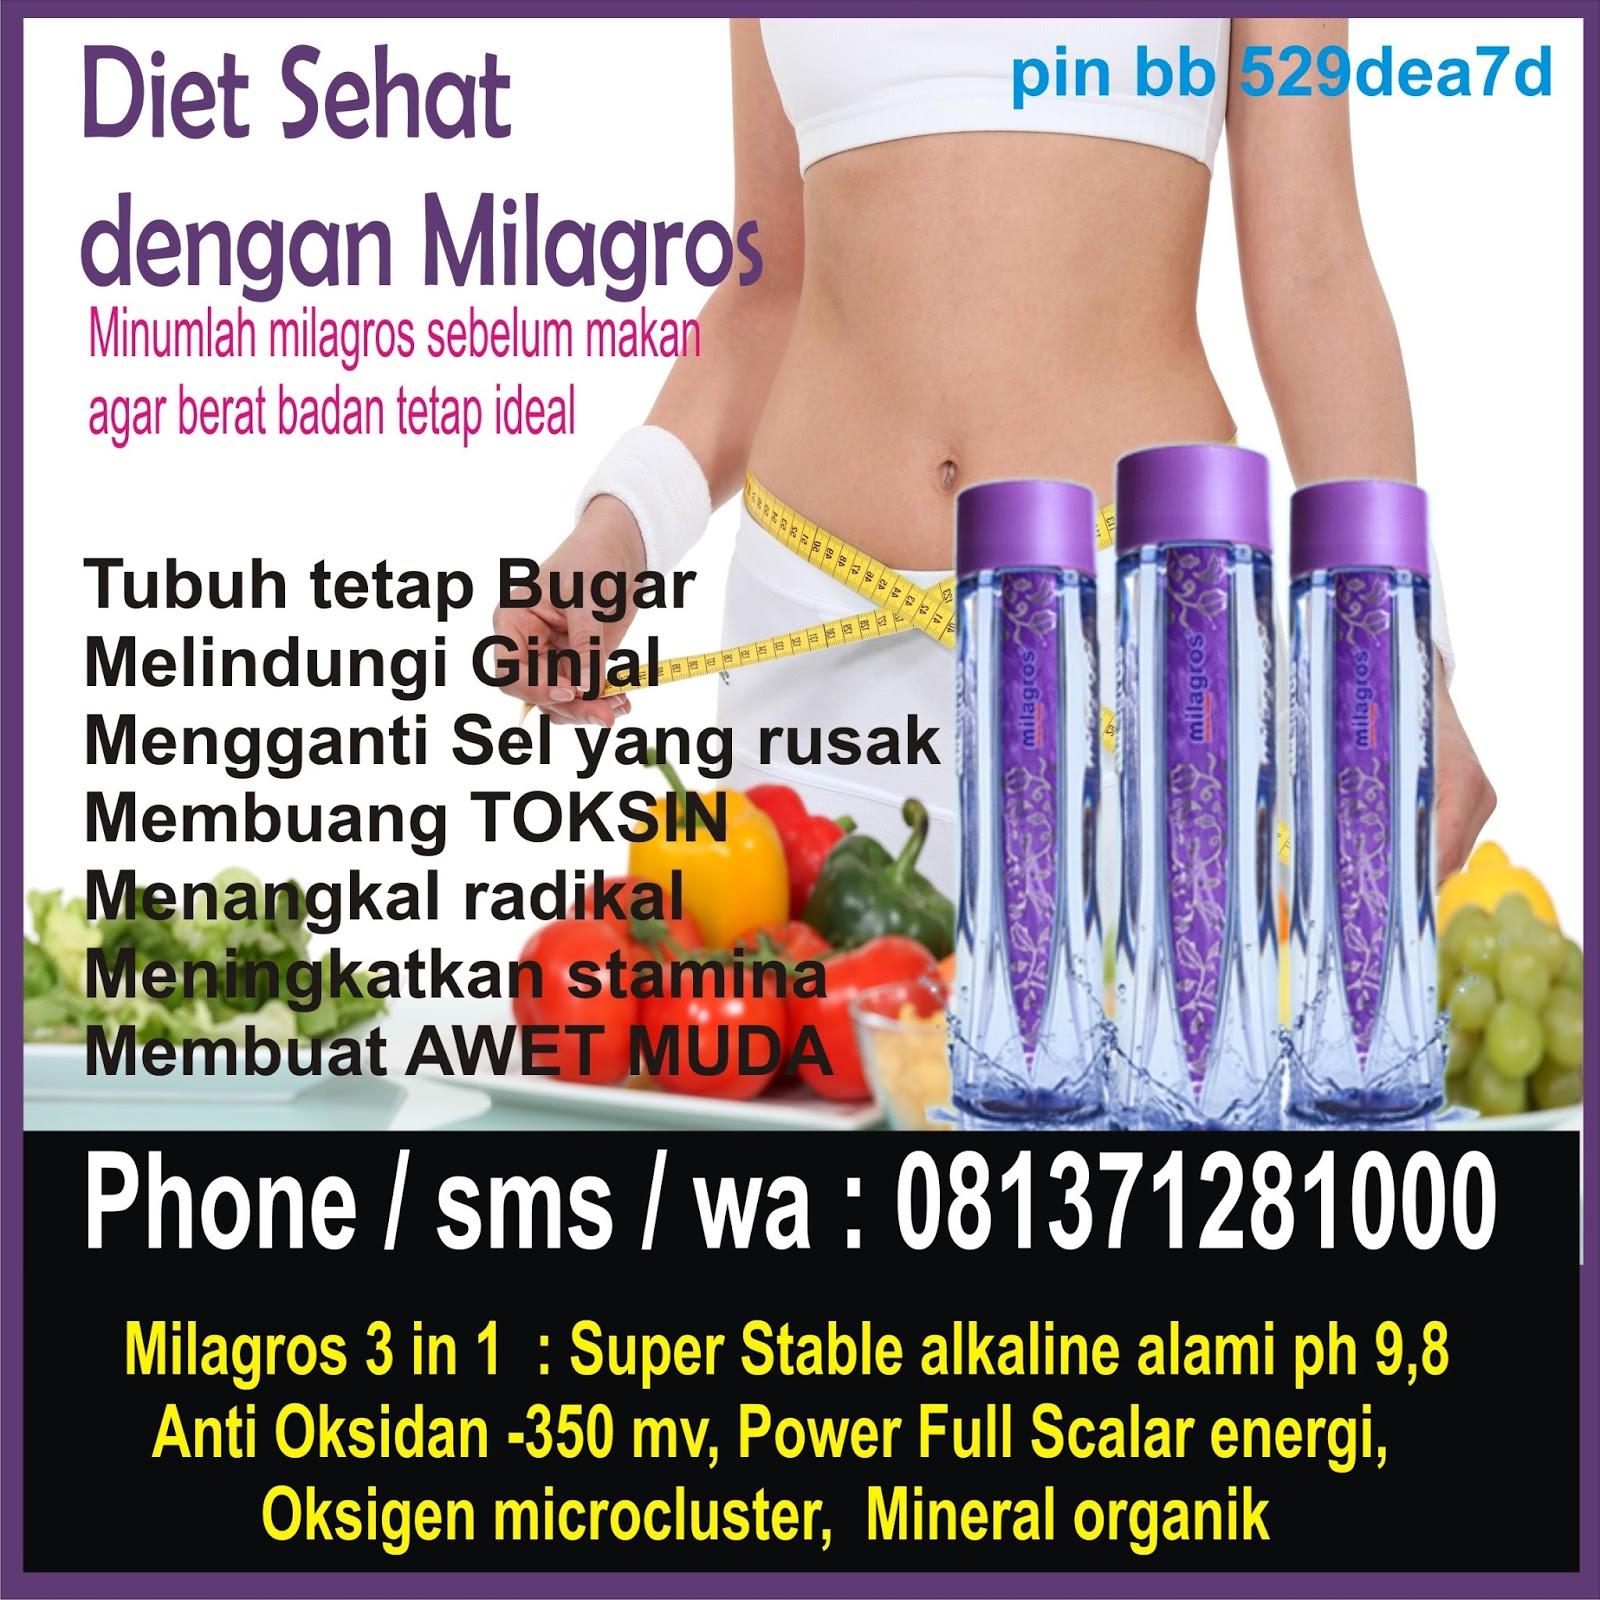 Mencari diet sehat ala Indonesia